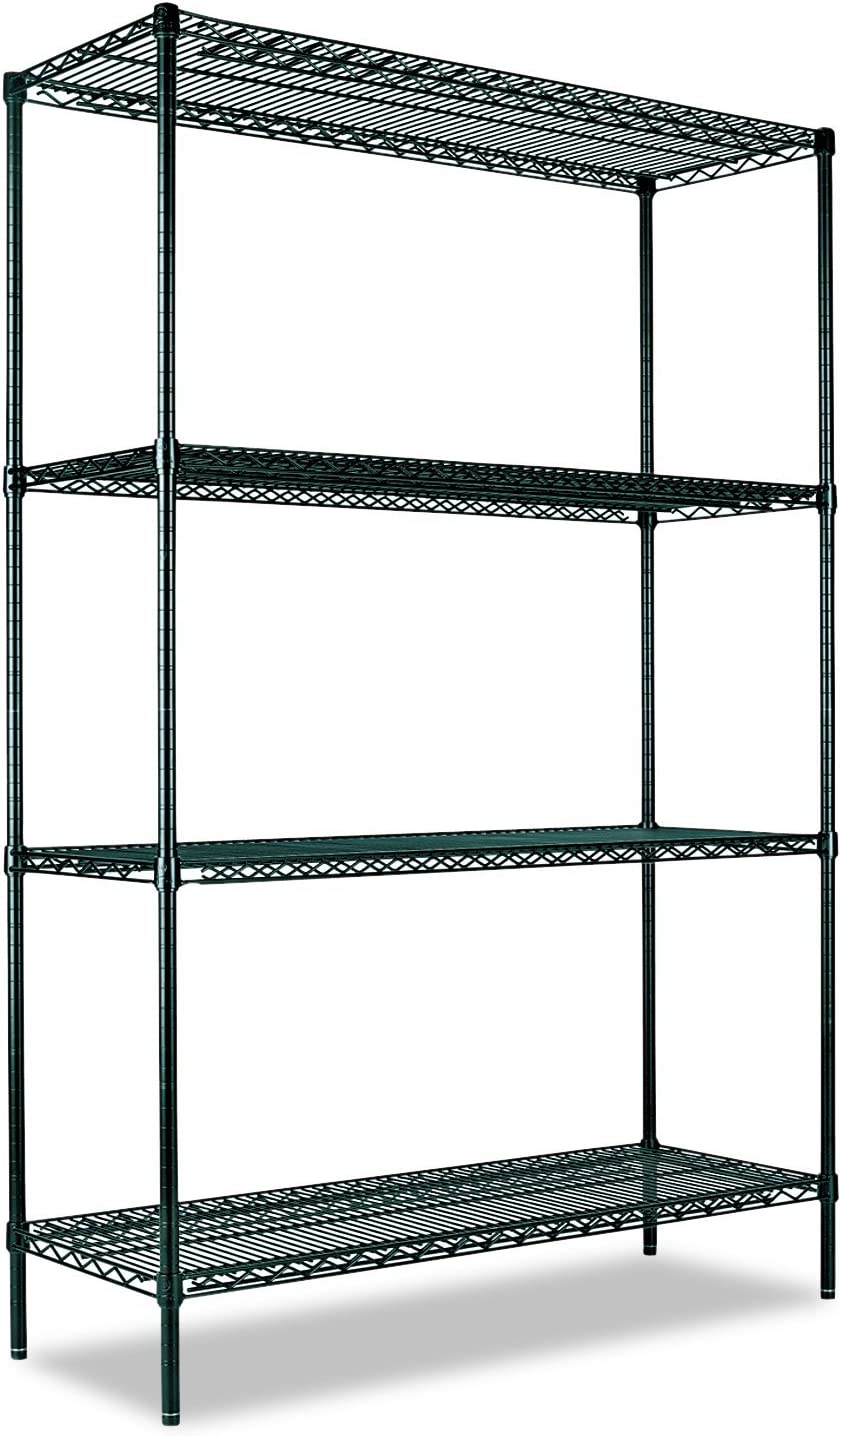 Alera Wire Shelving Unit Silver 36w x 14d x 54h 1000 lb Capacity Four-Shelf